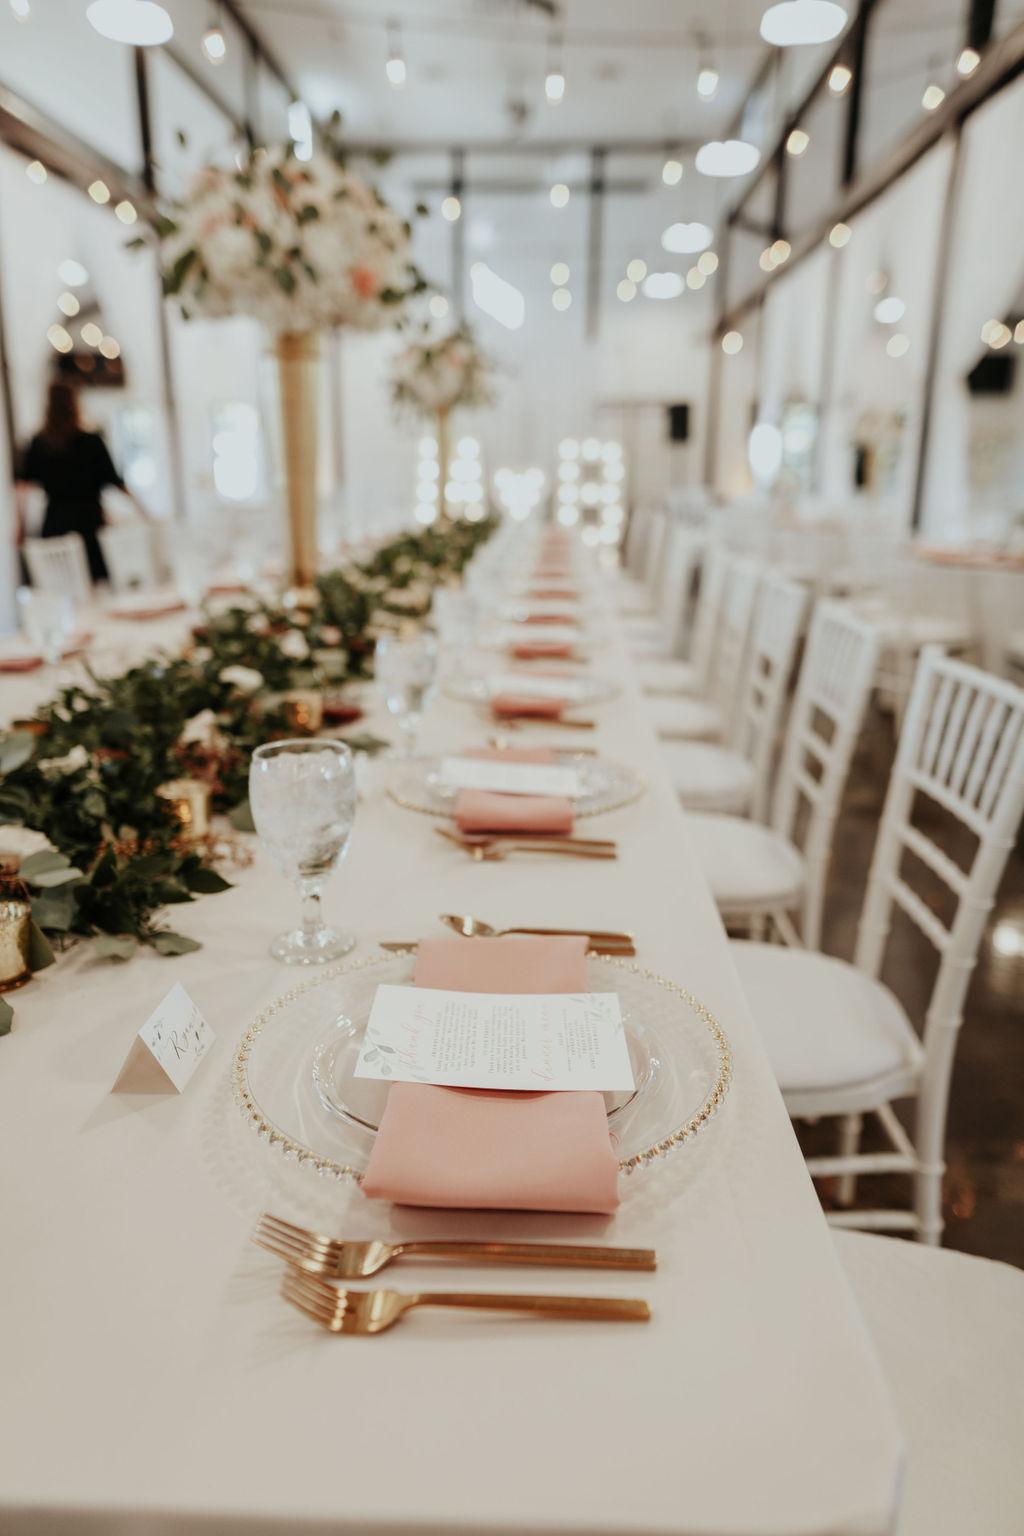 Best Oklahoma Outdoor Wedding Venue Tulsa Bixby White Barn 38.jpg